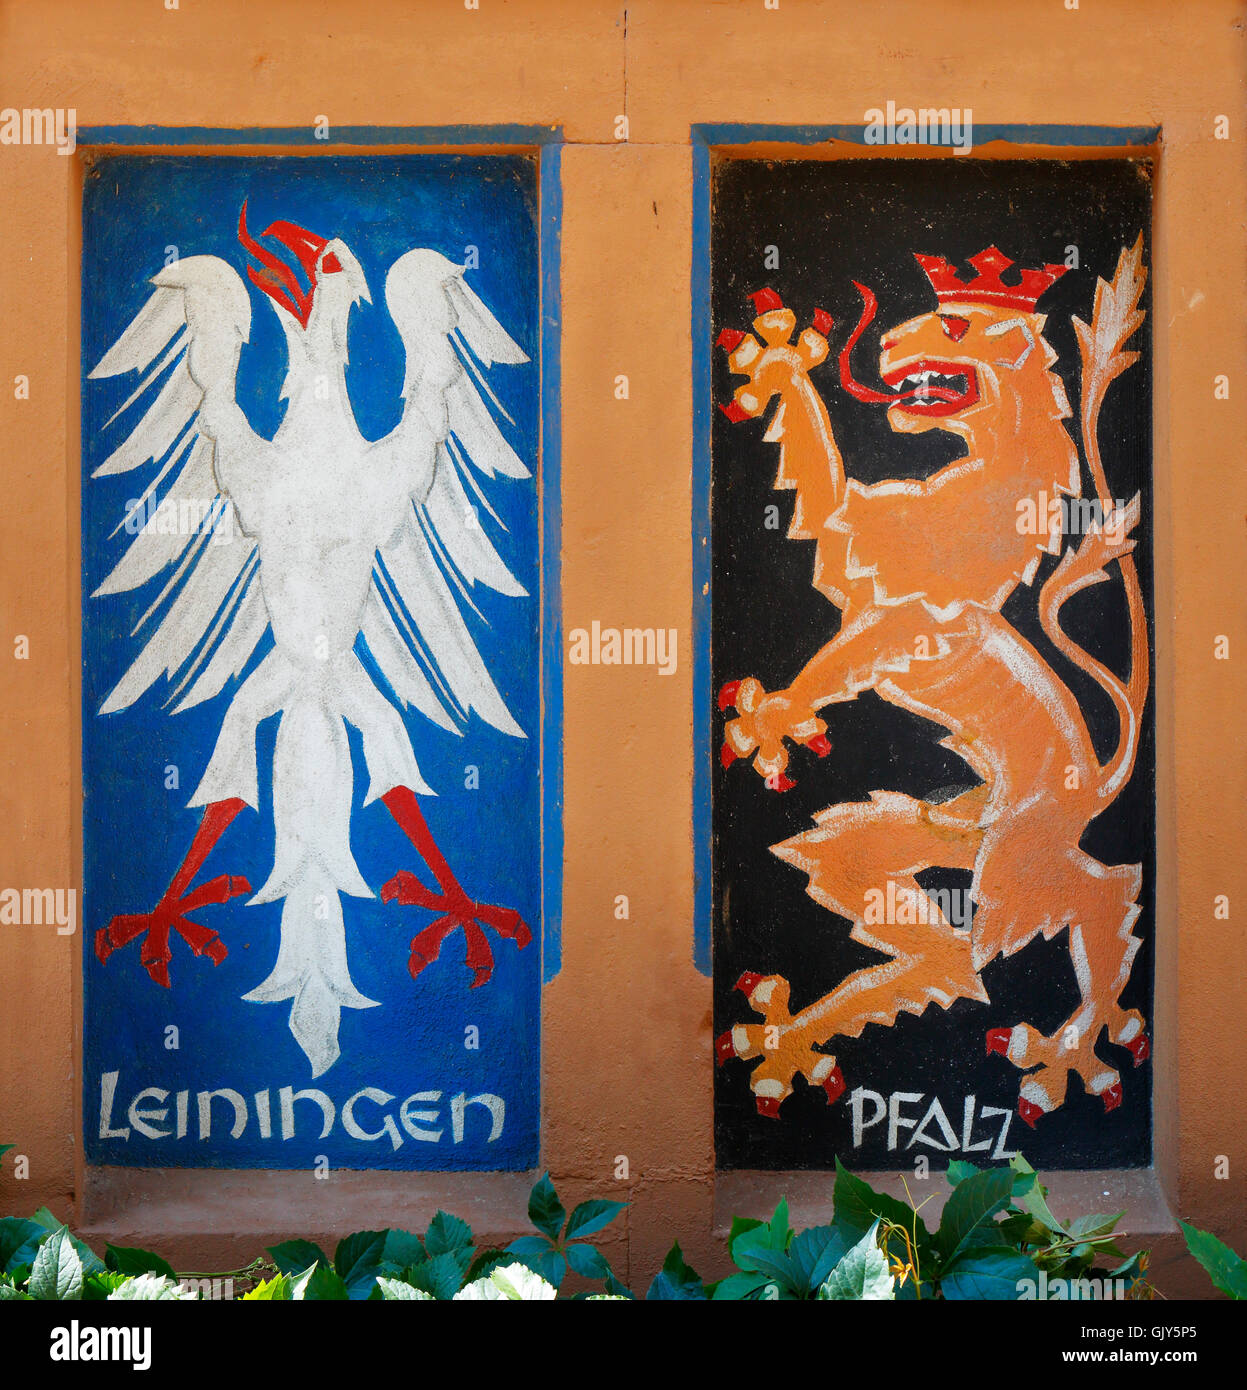 D-Worms, Rhine, Upper Rhine, Rhenish Hesse, Rhine-Neckar area, Rhine-Main district, Rhineland-Palatinate, D-Worms - Stock Image